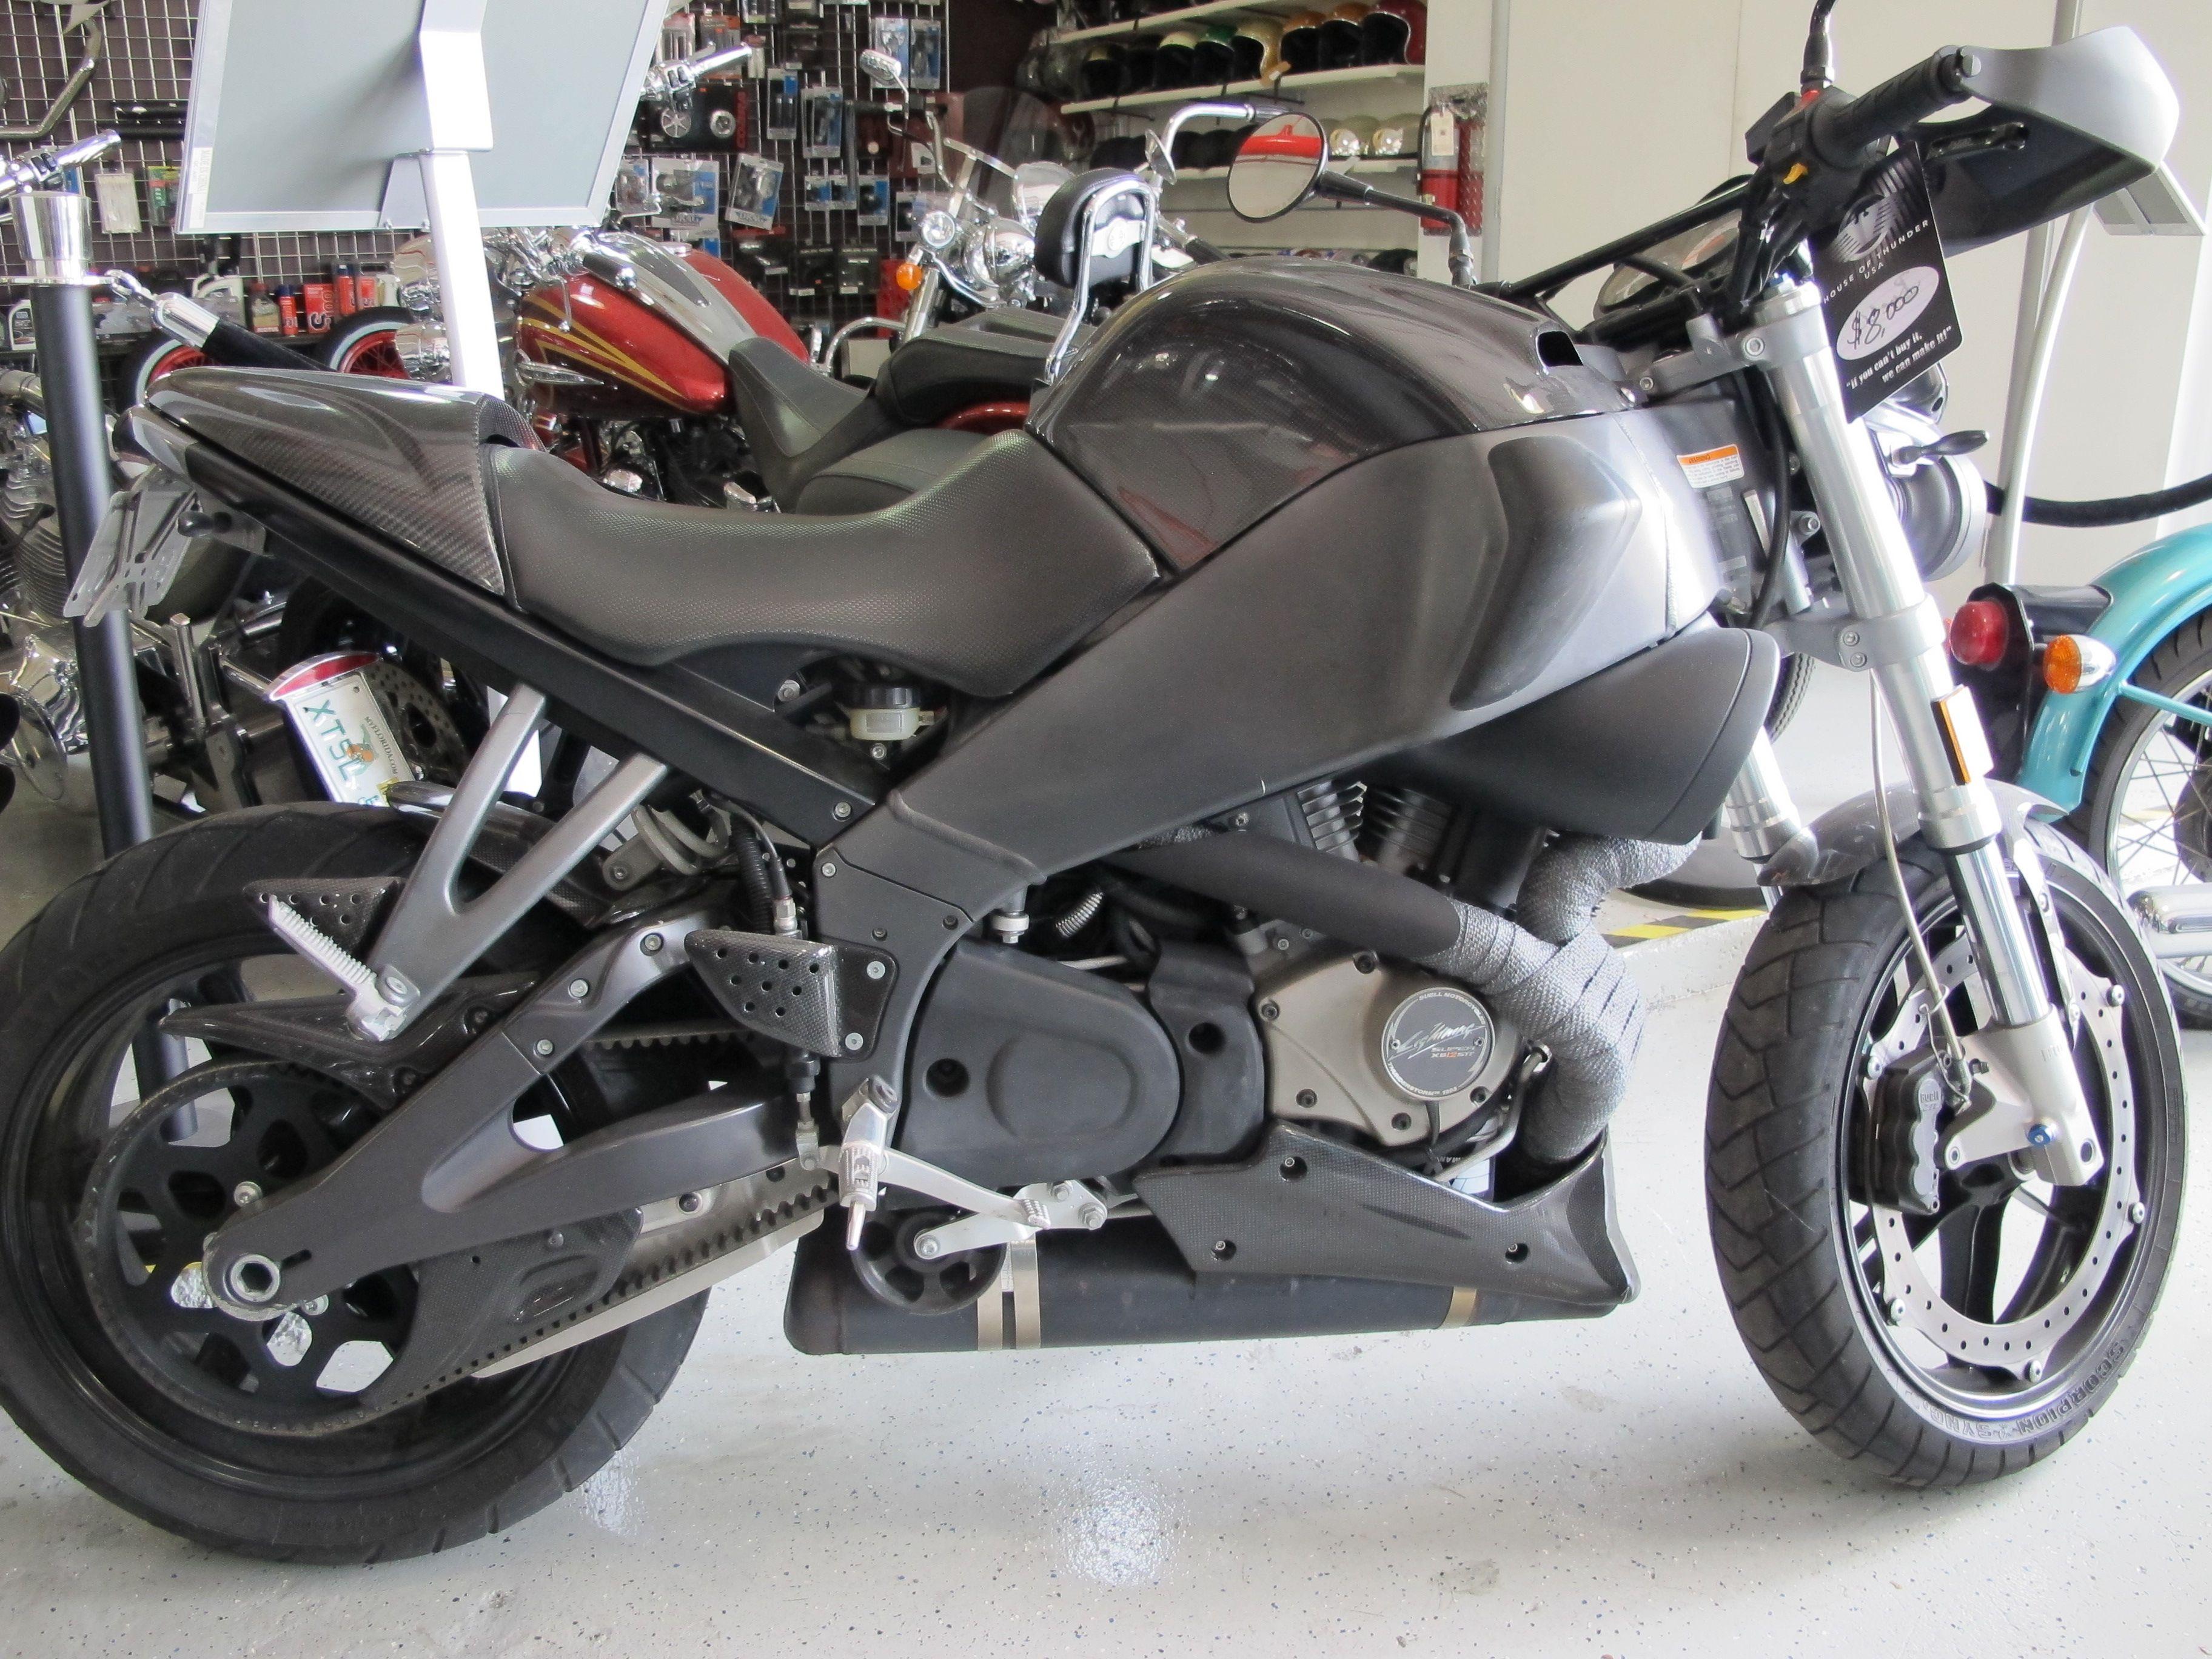 Buell bikerental bikesales mechanic miami